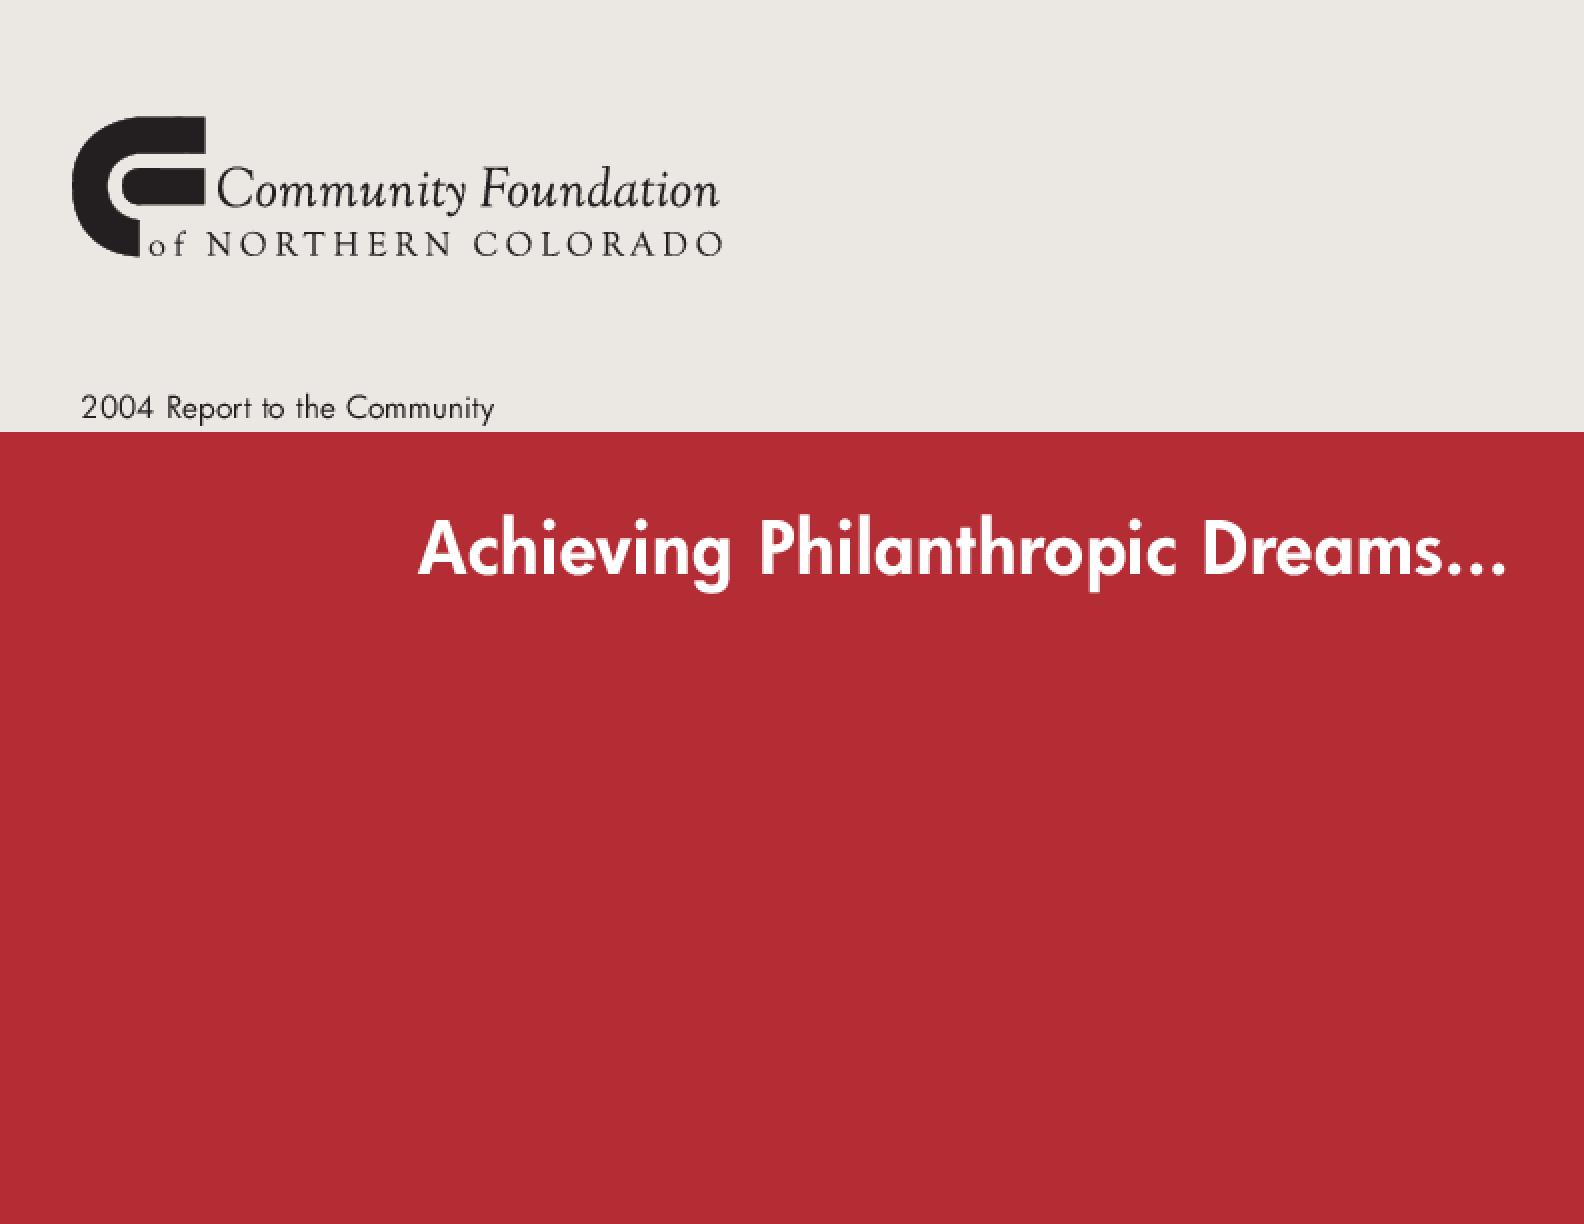 Community Foundation of Northern Colorado - 2004 Annual Report: Achieving Philanthropic Dreams ...